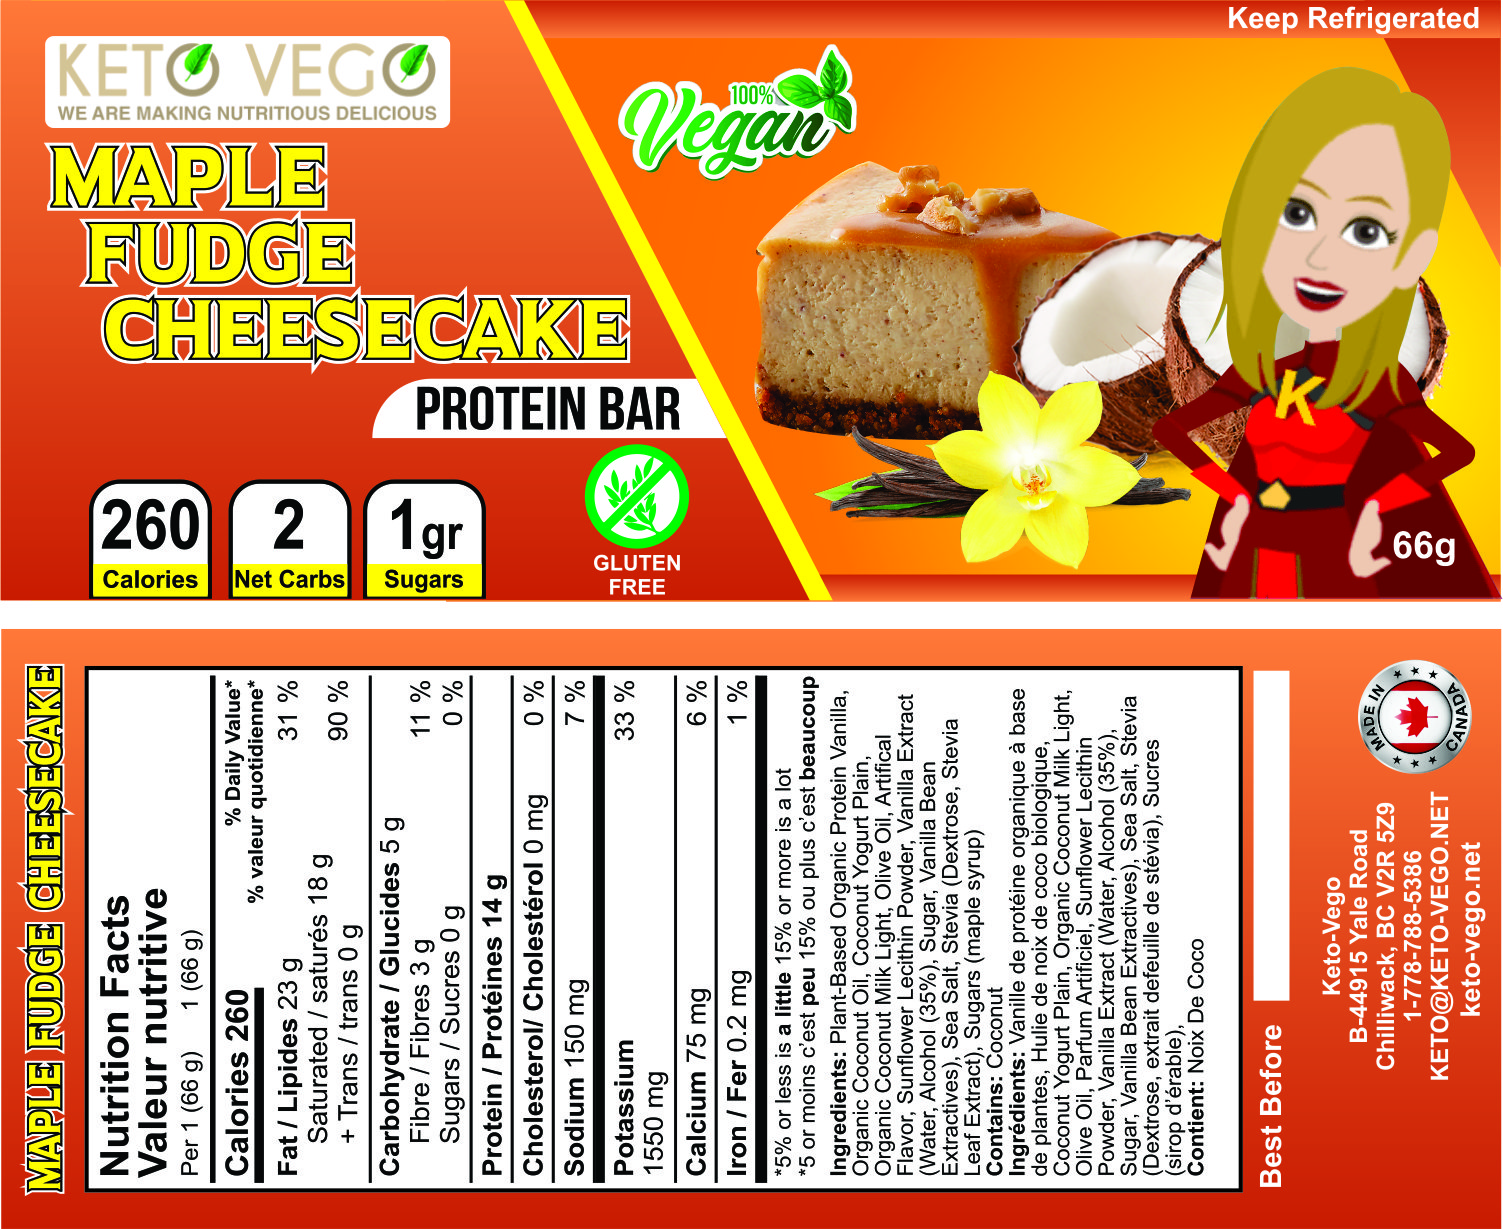 Keto Vego - Maple Fudge Cheesecake label